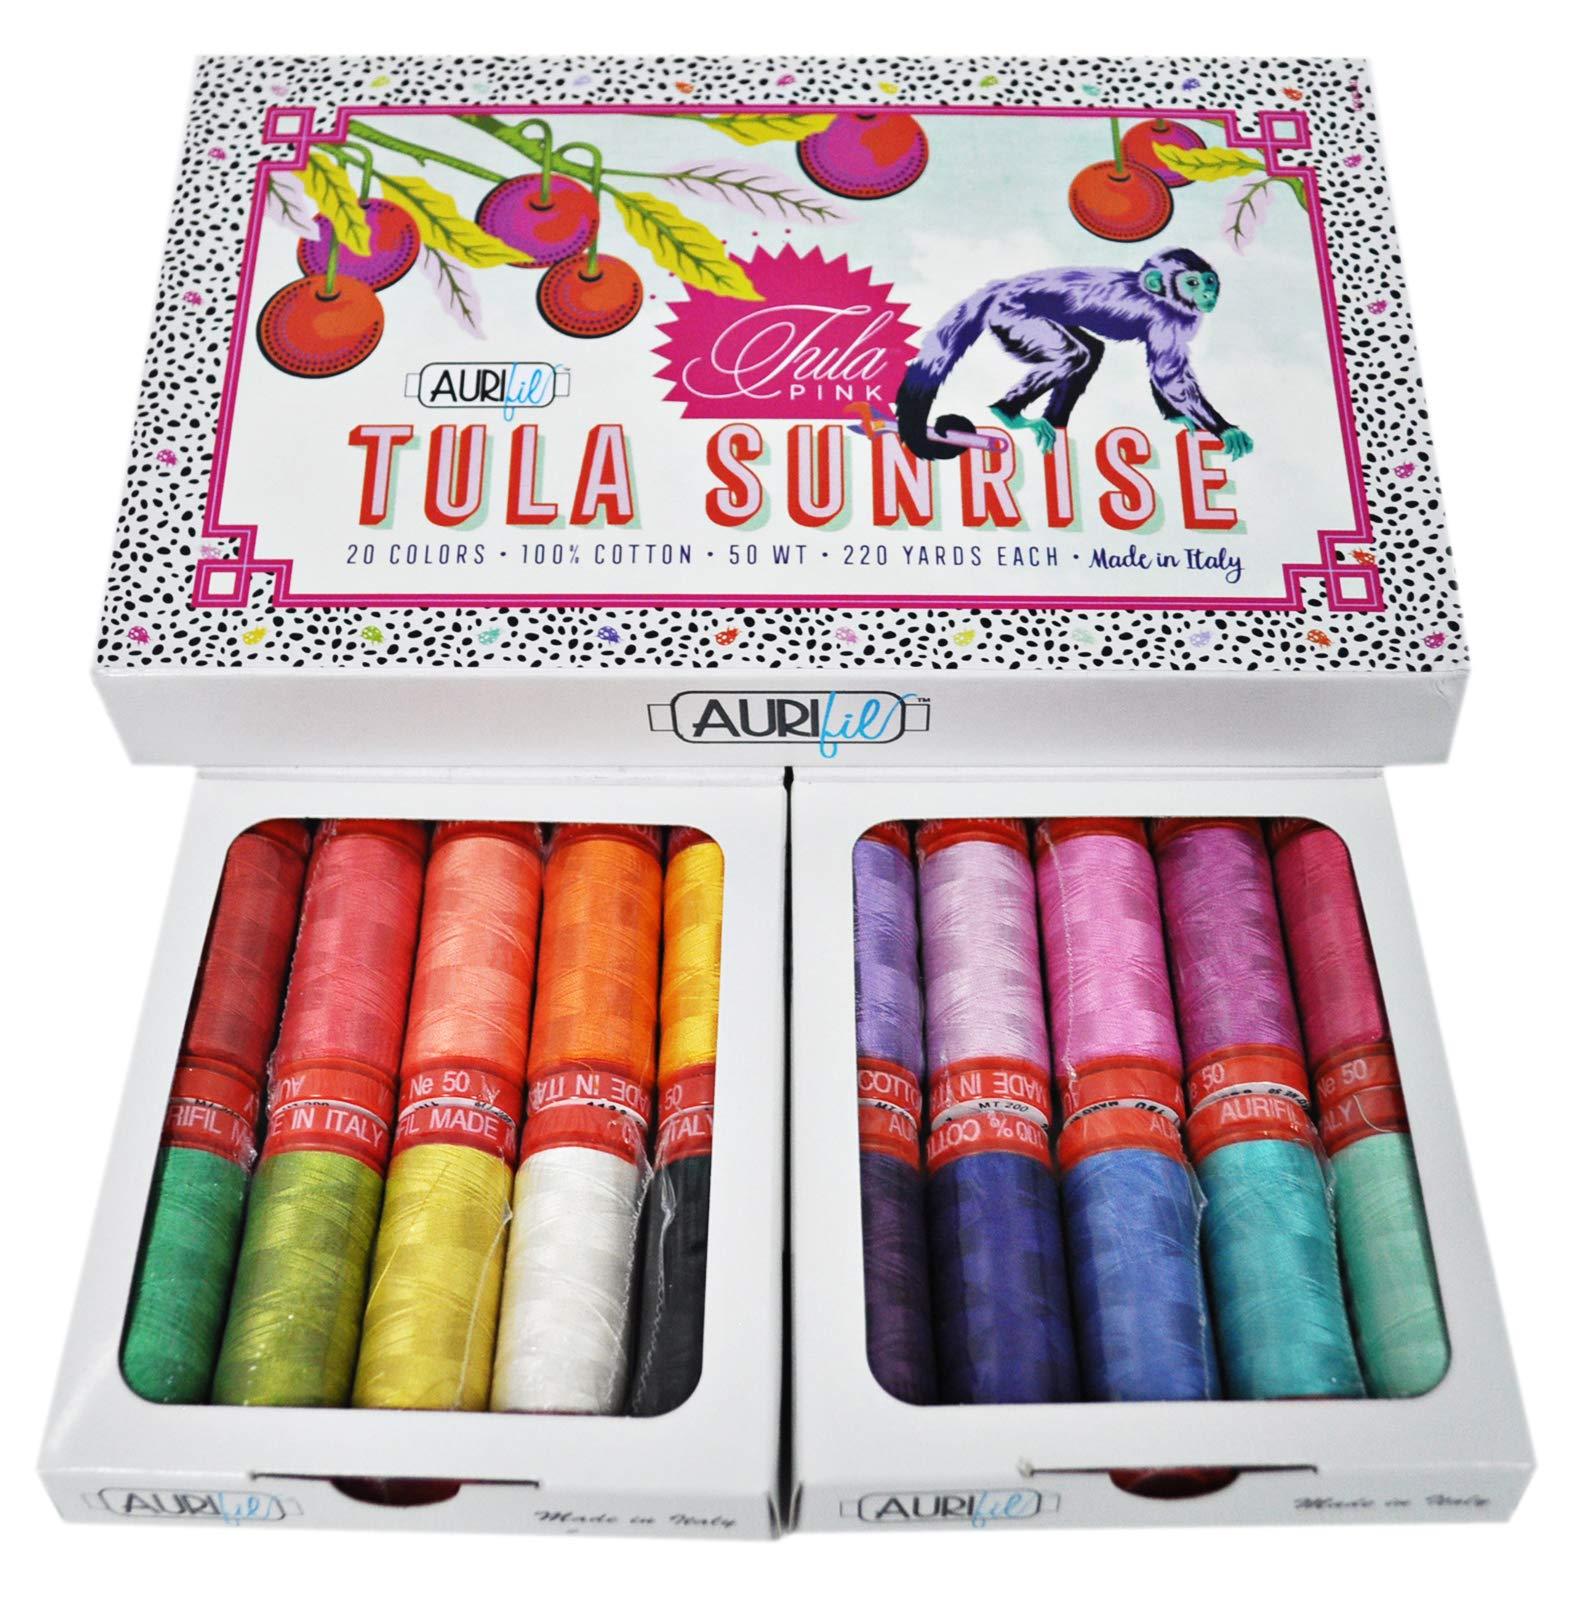 Tula Pink Tula Sunrise Aurifil Thread Kit 20 Small Spools 50 Weight TP50SC20 by Aurifil